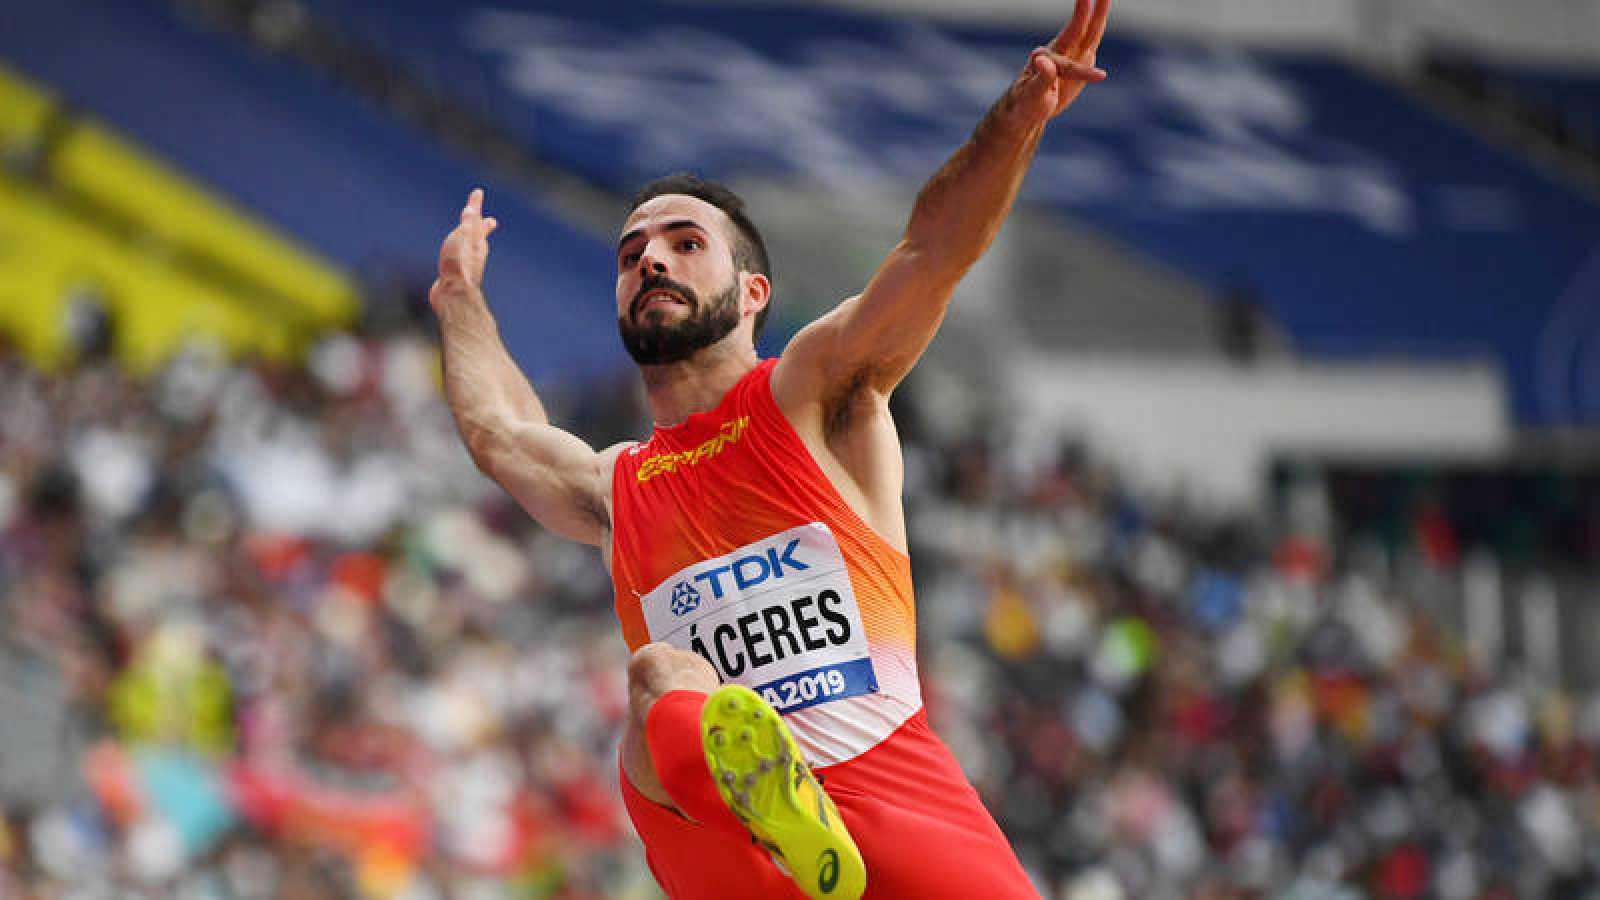 Eusebio Cáceres accede a su segunda final mundialista en longitud